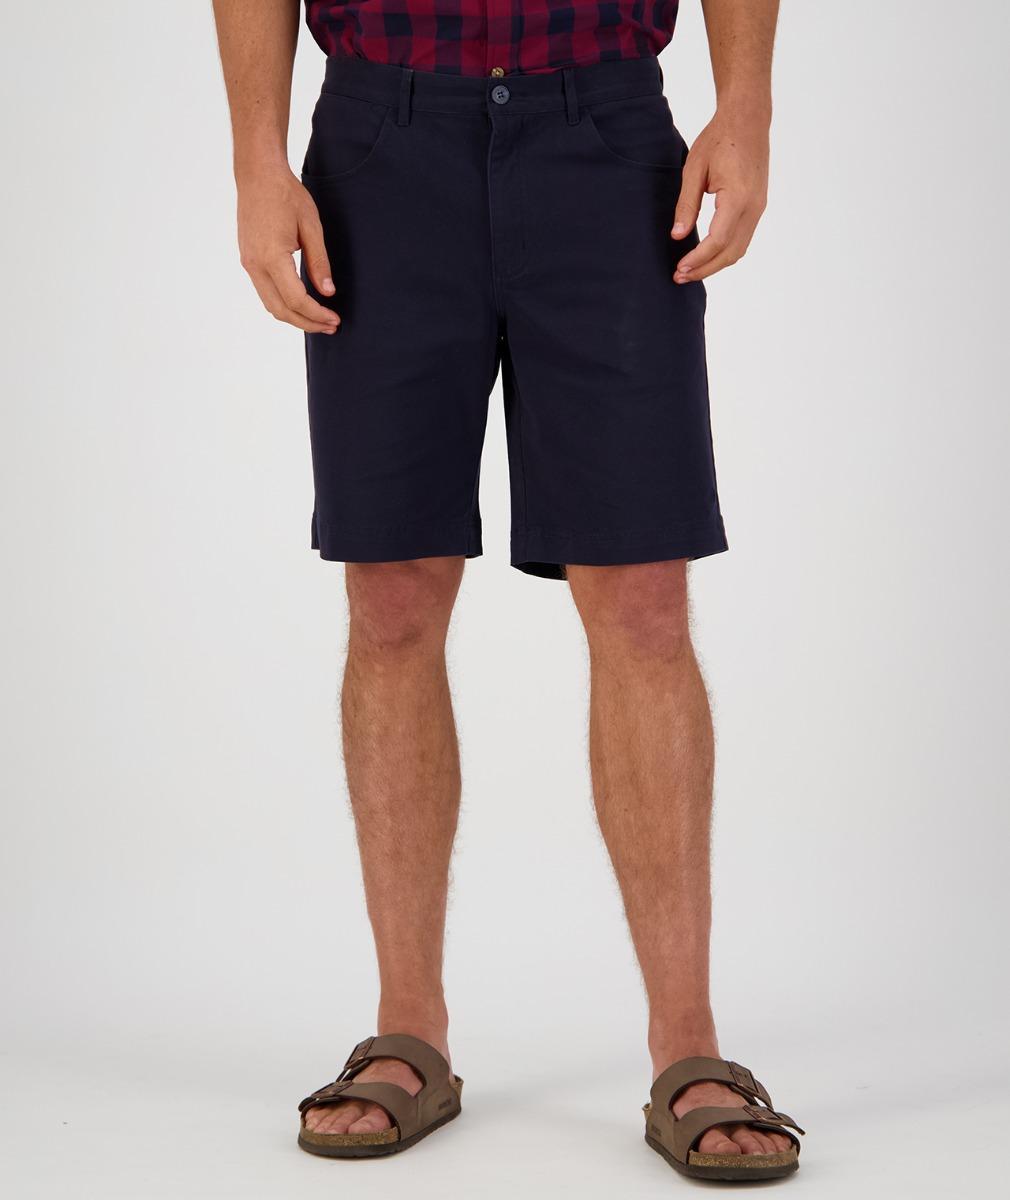 Swanndri Men's Collingwood Stretch Shorts in Dark Navy